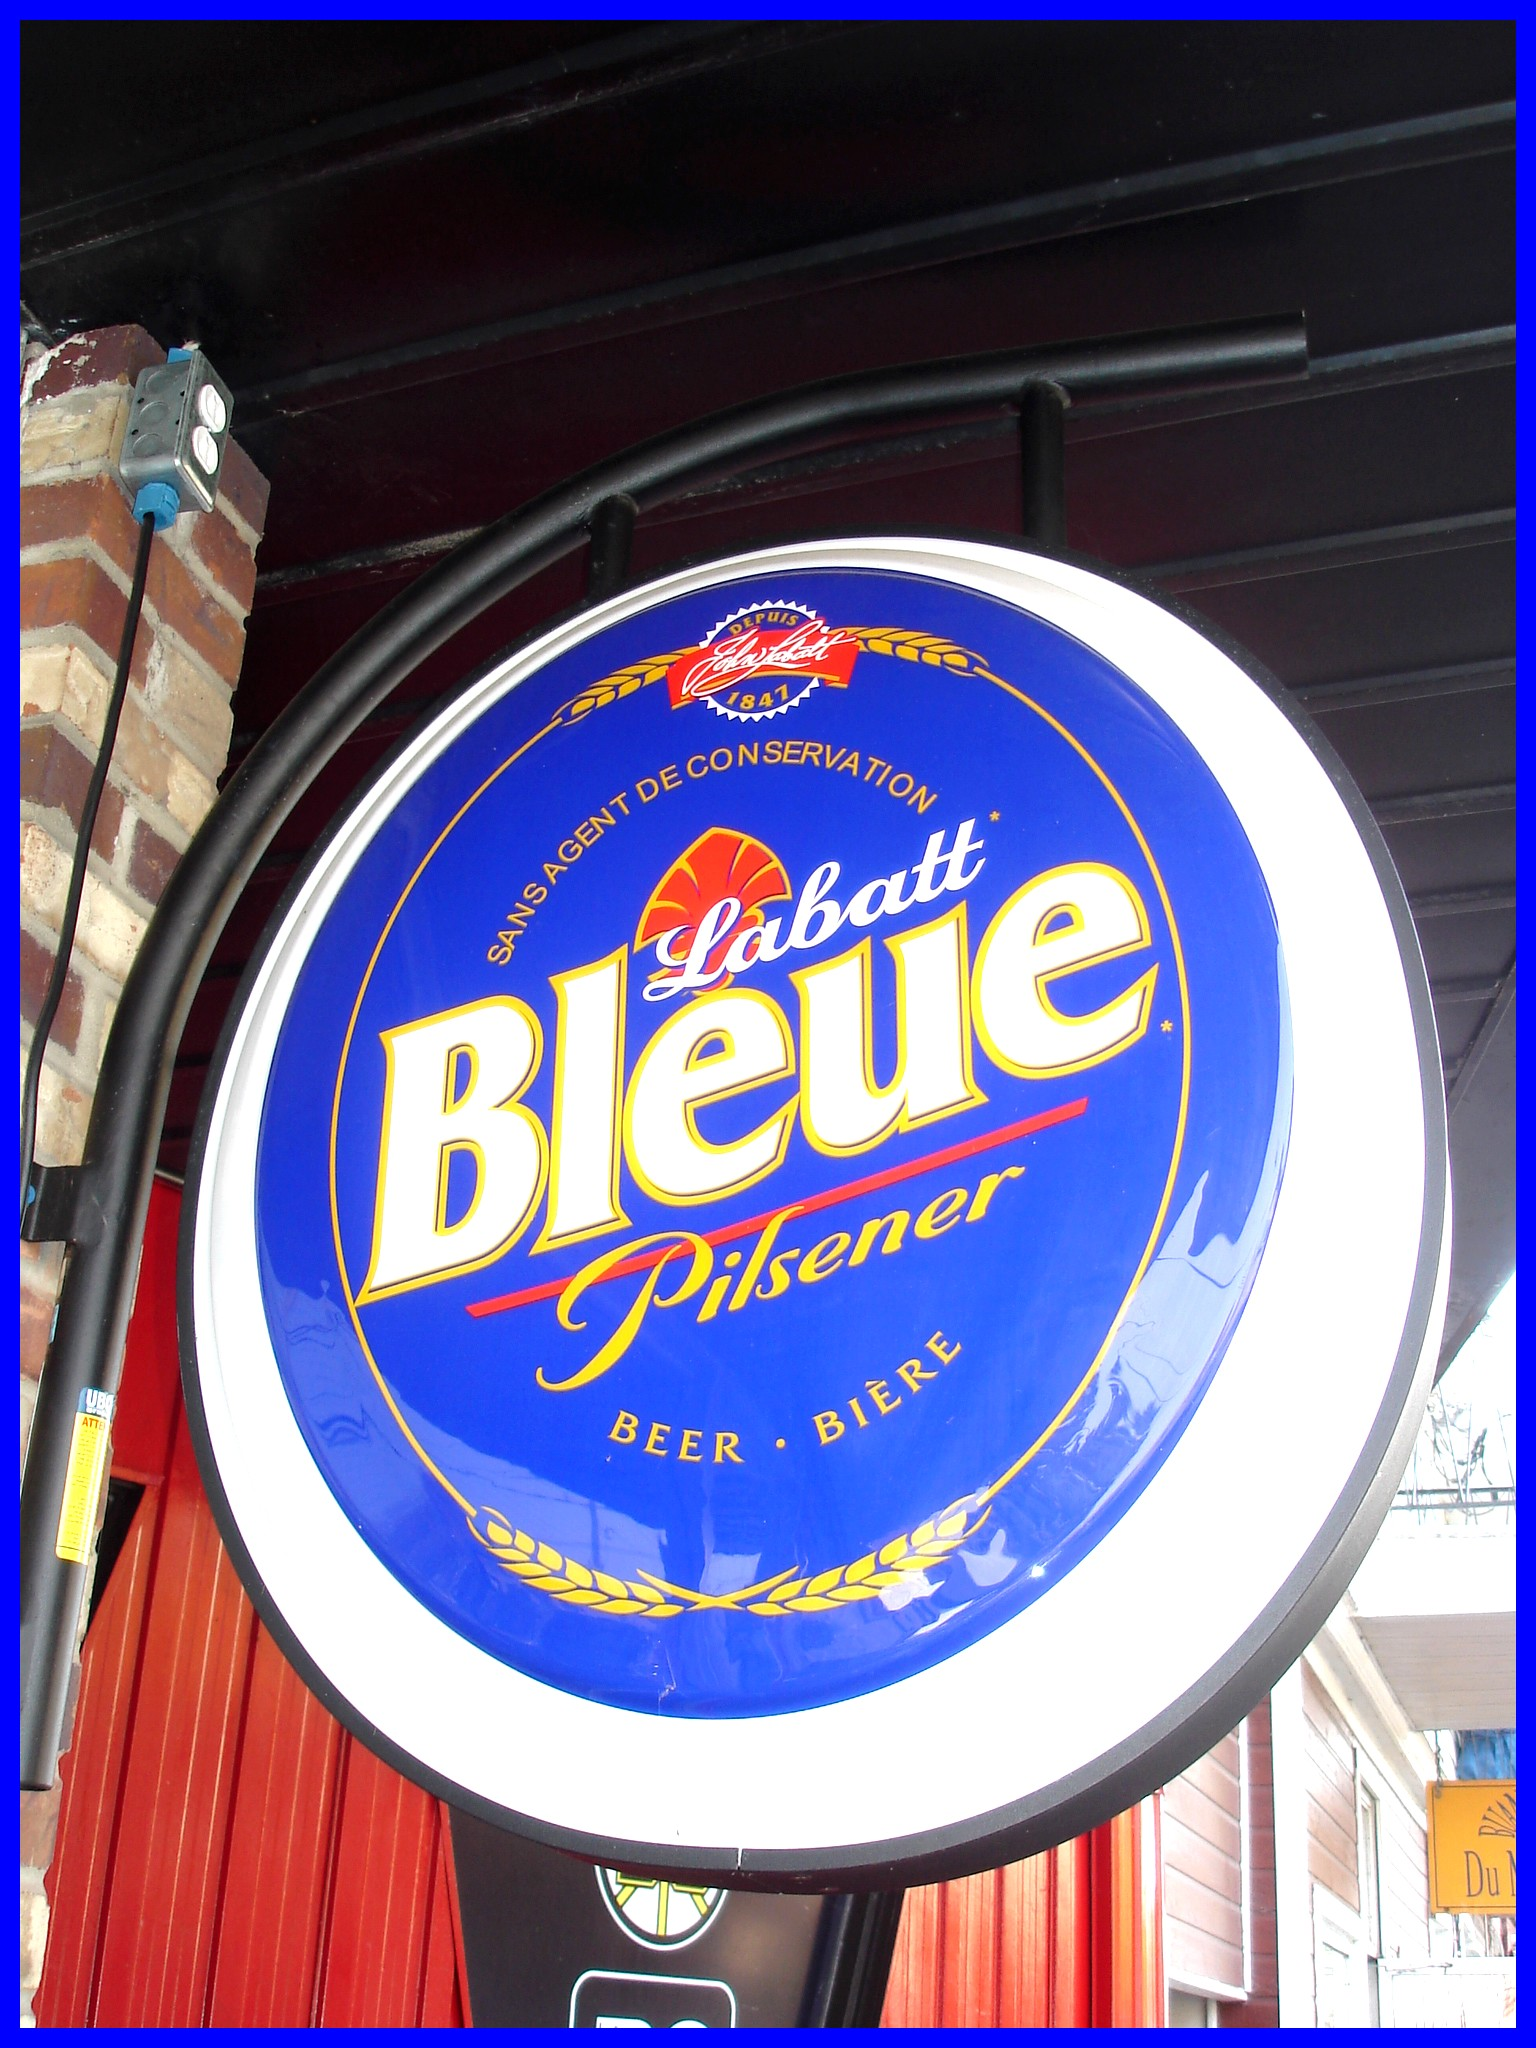 Labatt Bleue Pilsener  - Hometown blue hops sign - Dans ma ville / 12-10-2008.